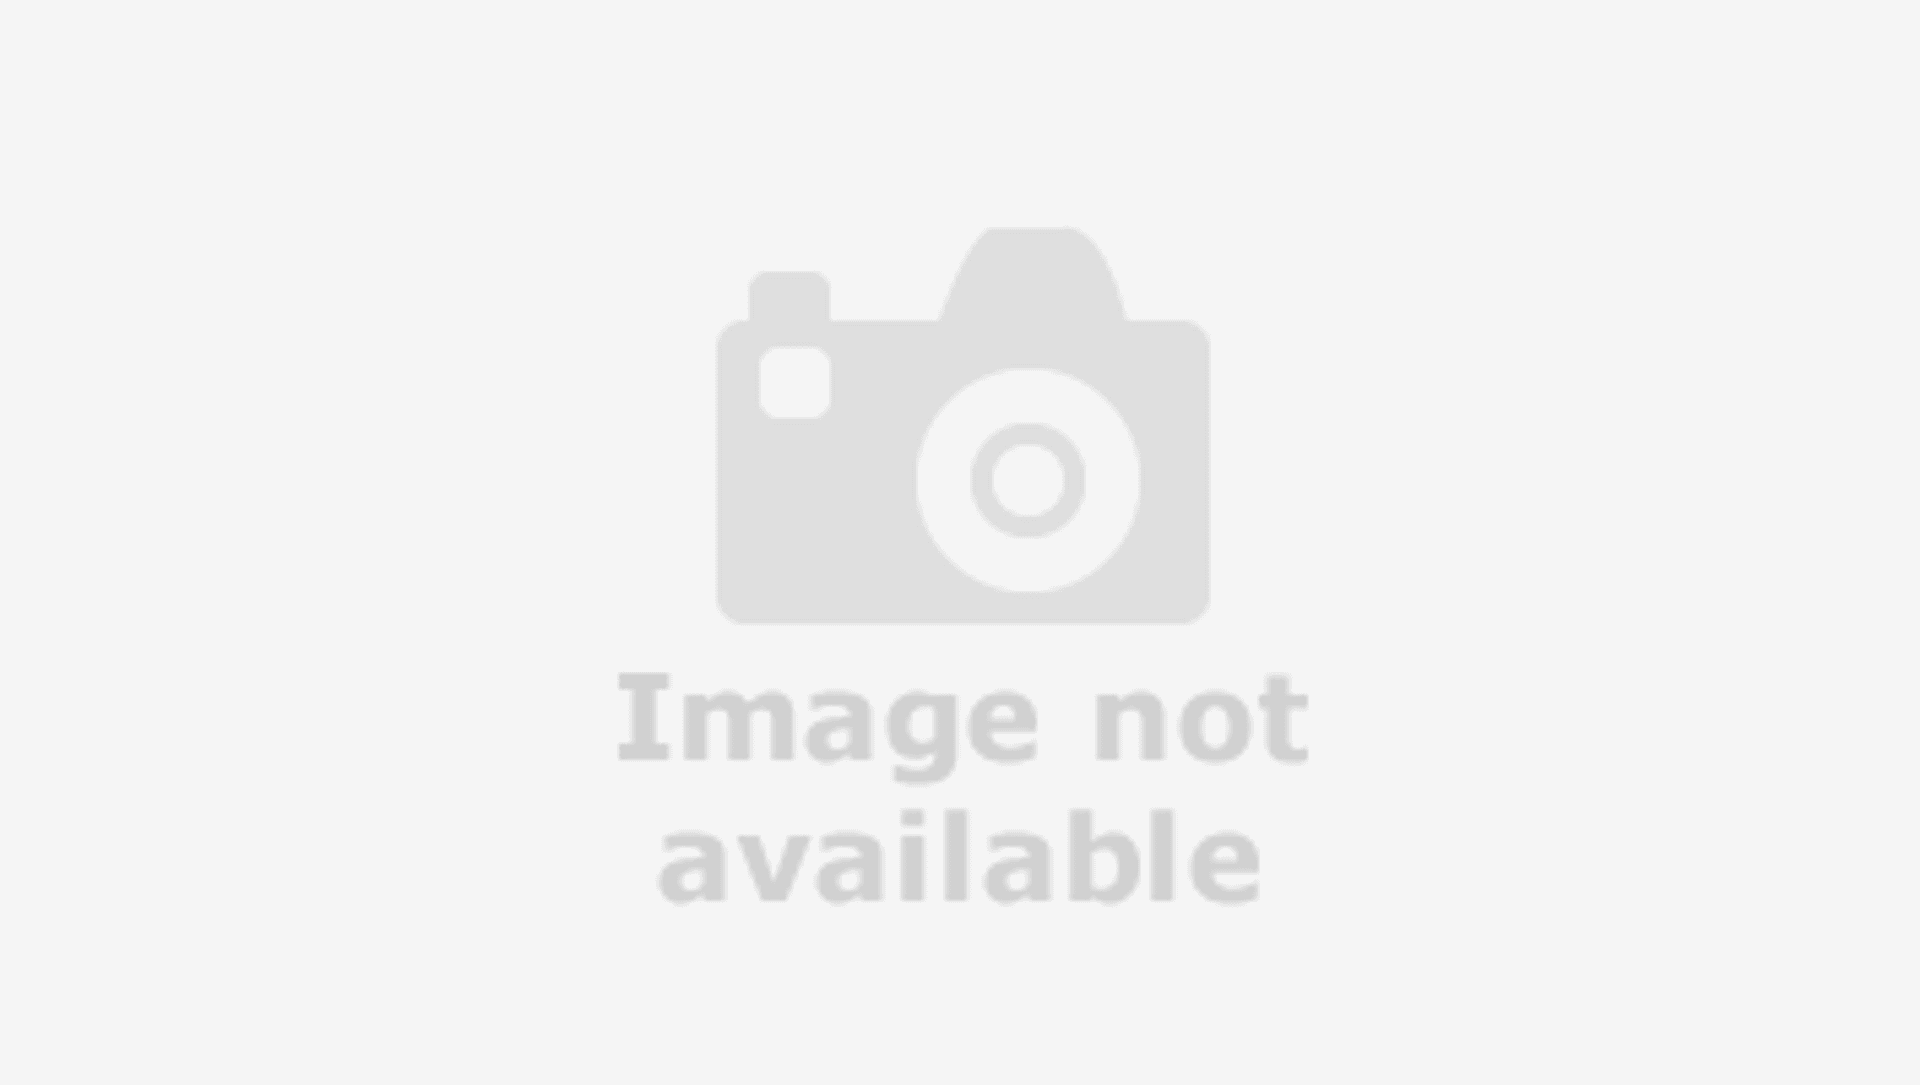 Isuzu D-Max Utah Huntsman image